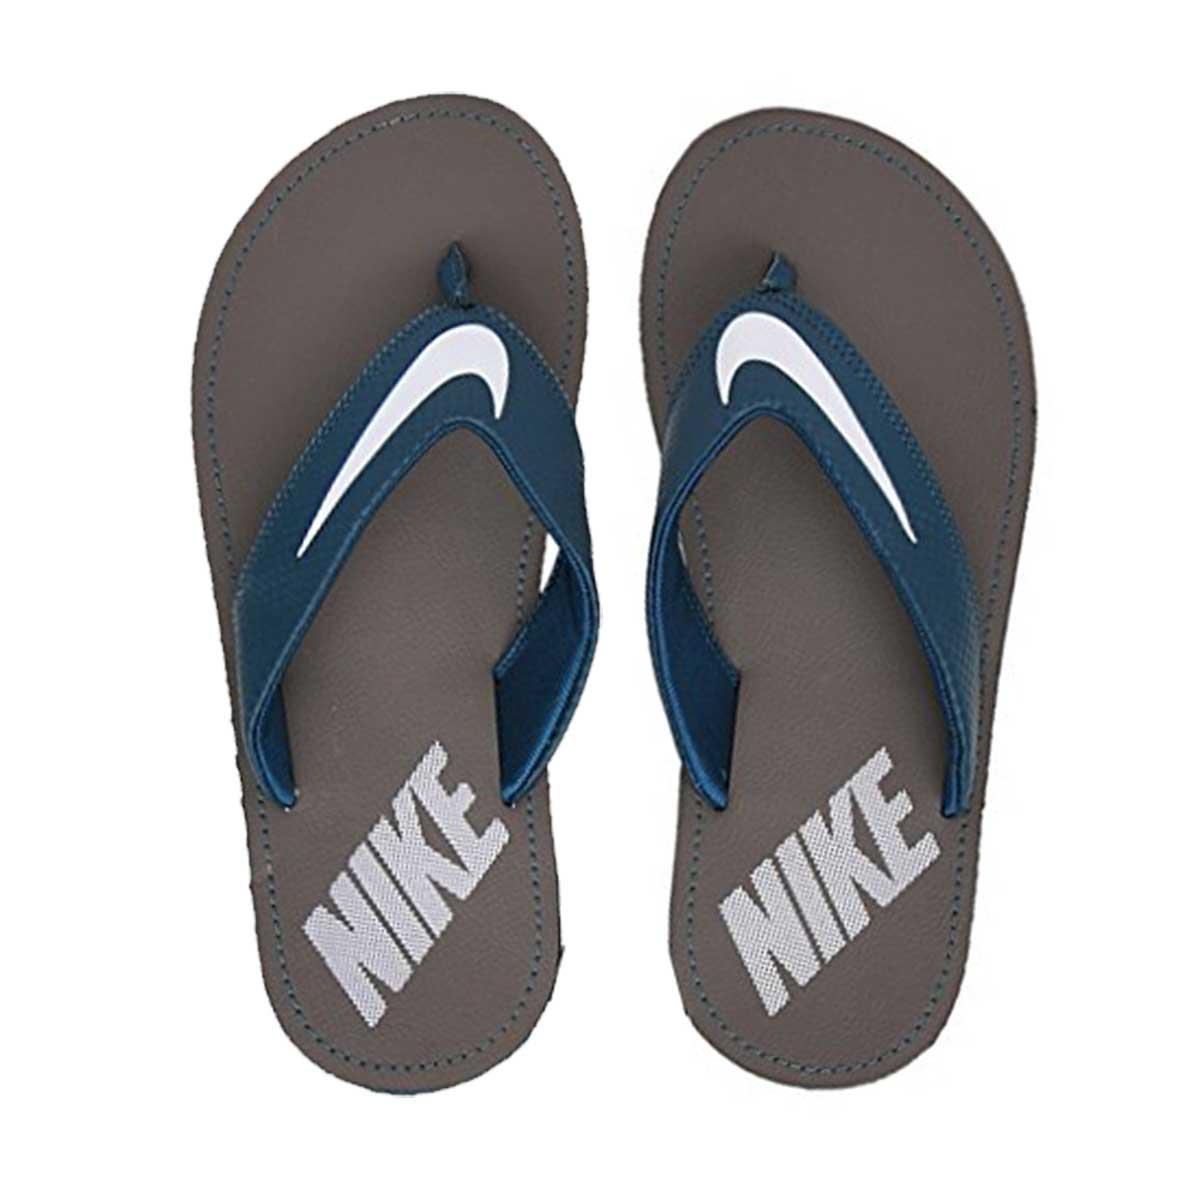 Flip Flops, Shoes, Buy, Nike, Nike Chroma Thong 4 Slippers (Brown / Green /  White)